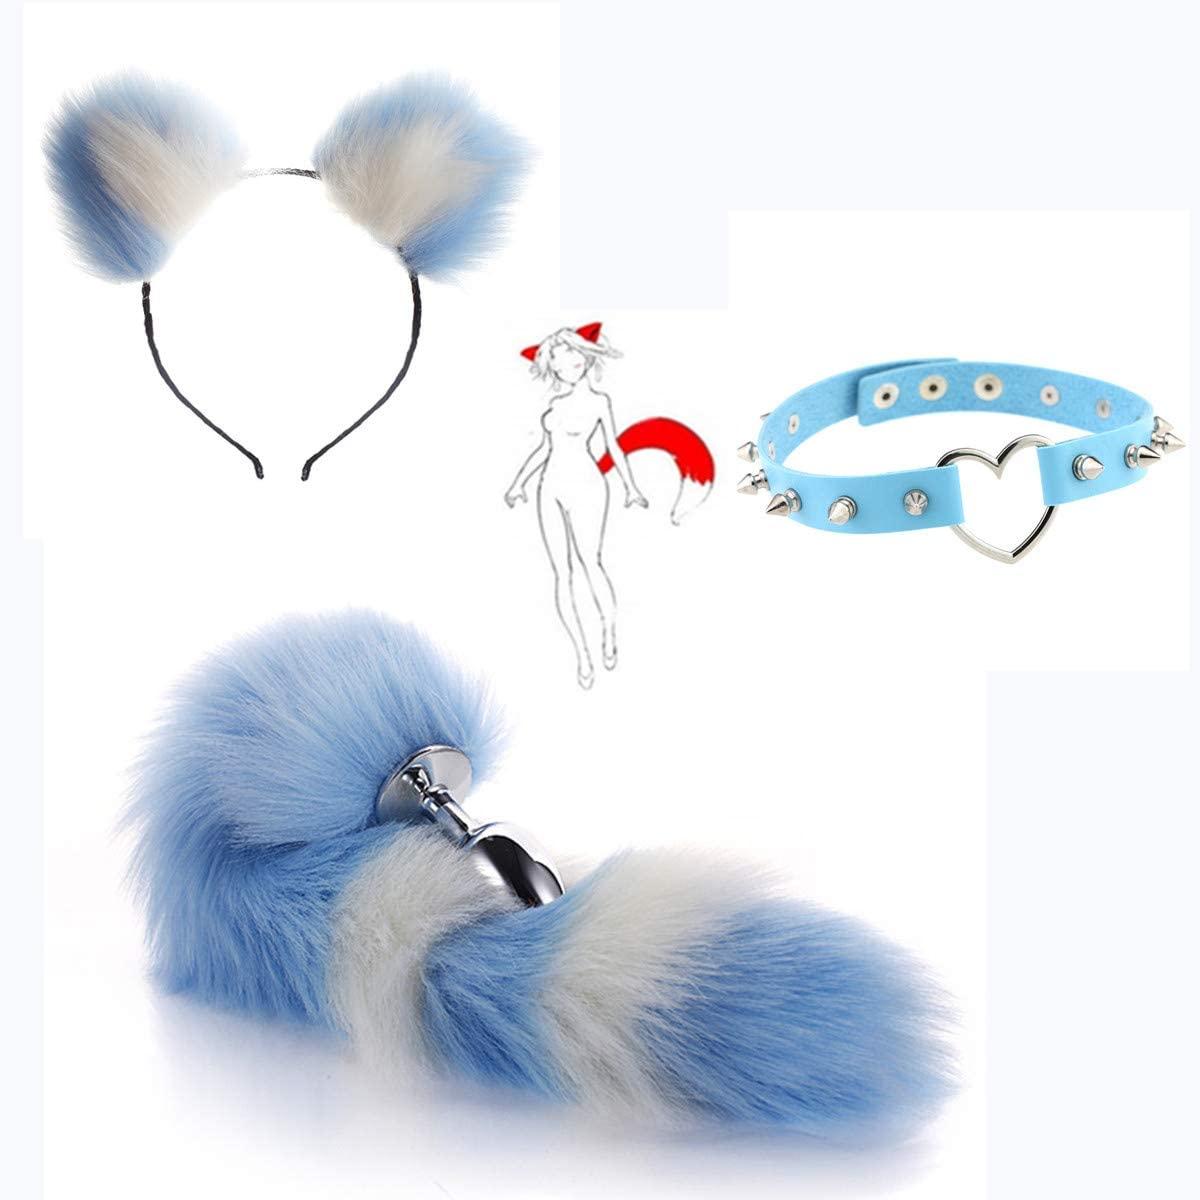 3Pcs/Set Fluffy B-ütt Pl-ǔg Fox Tail Plush Cat Ears,Heart-Shape Spikes Collar Choker Necklack Masquerade Halloween Costume Cosplay Props - L